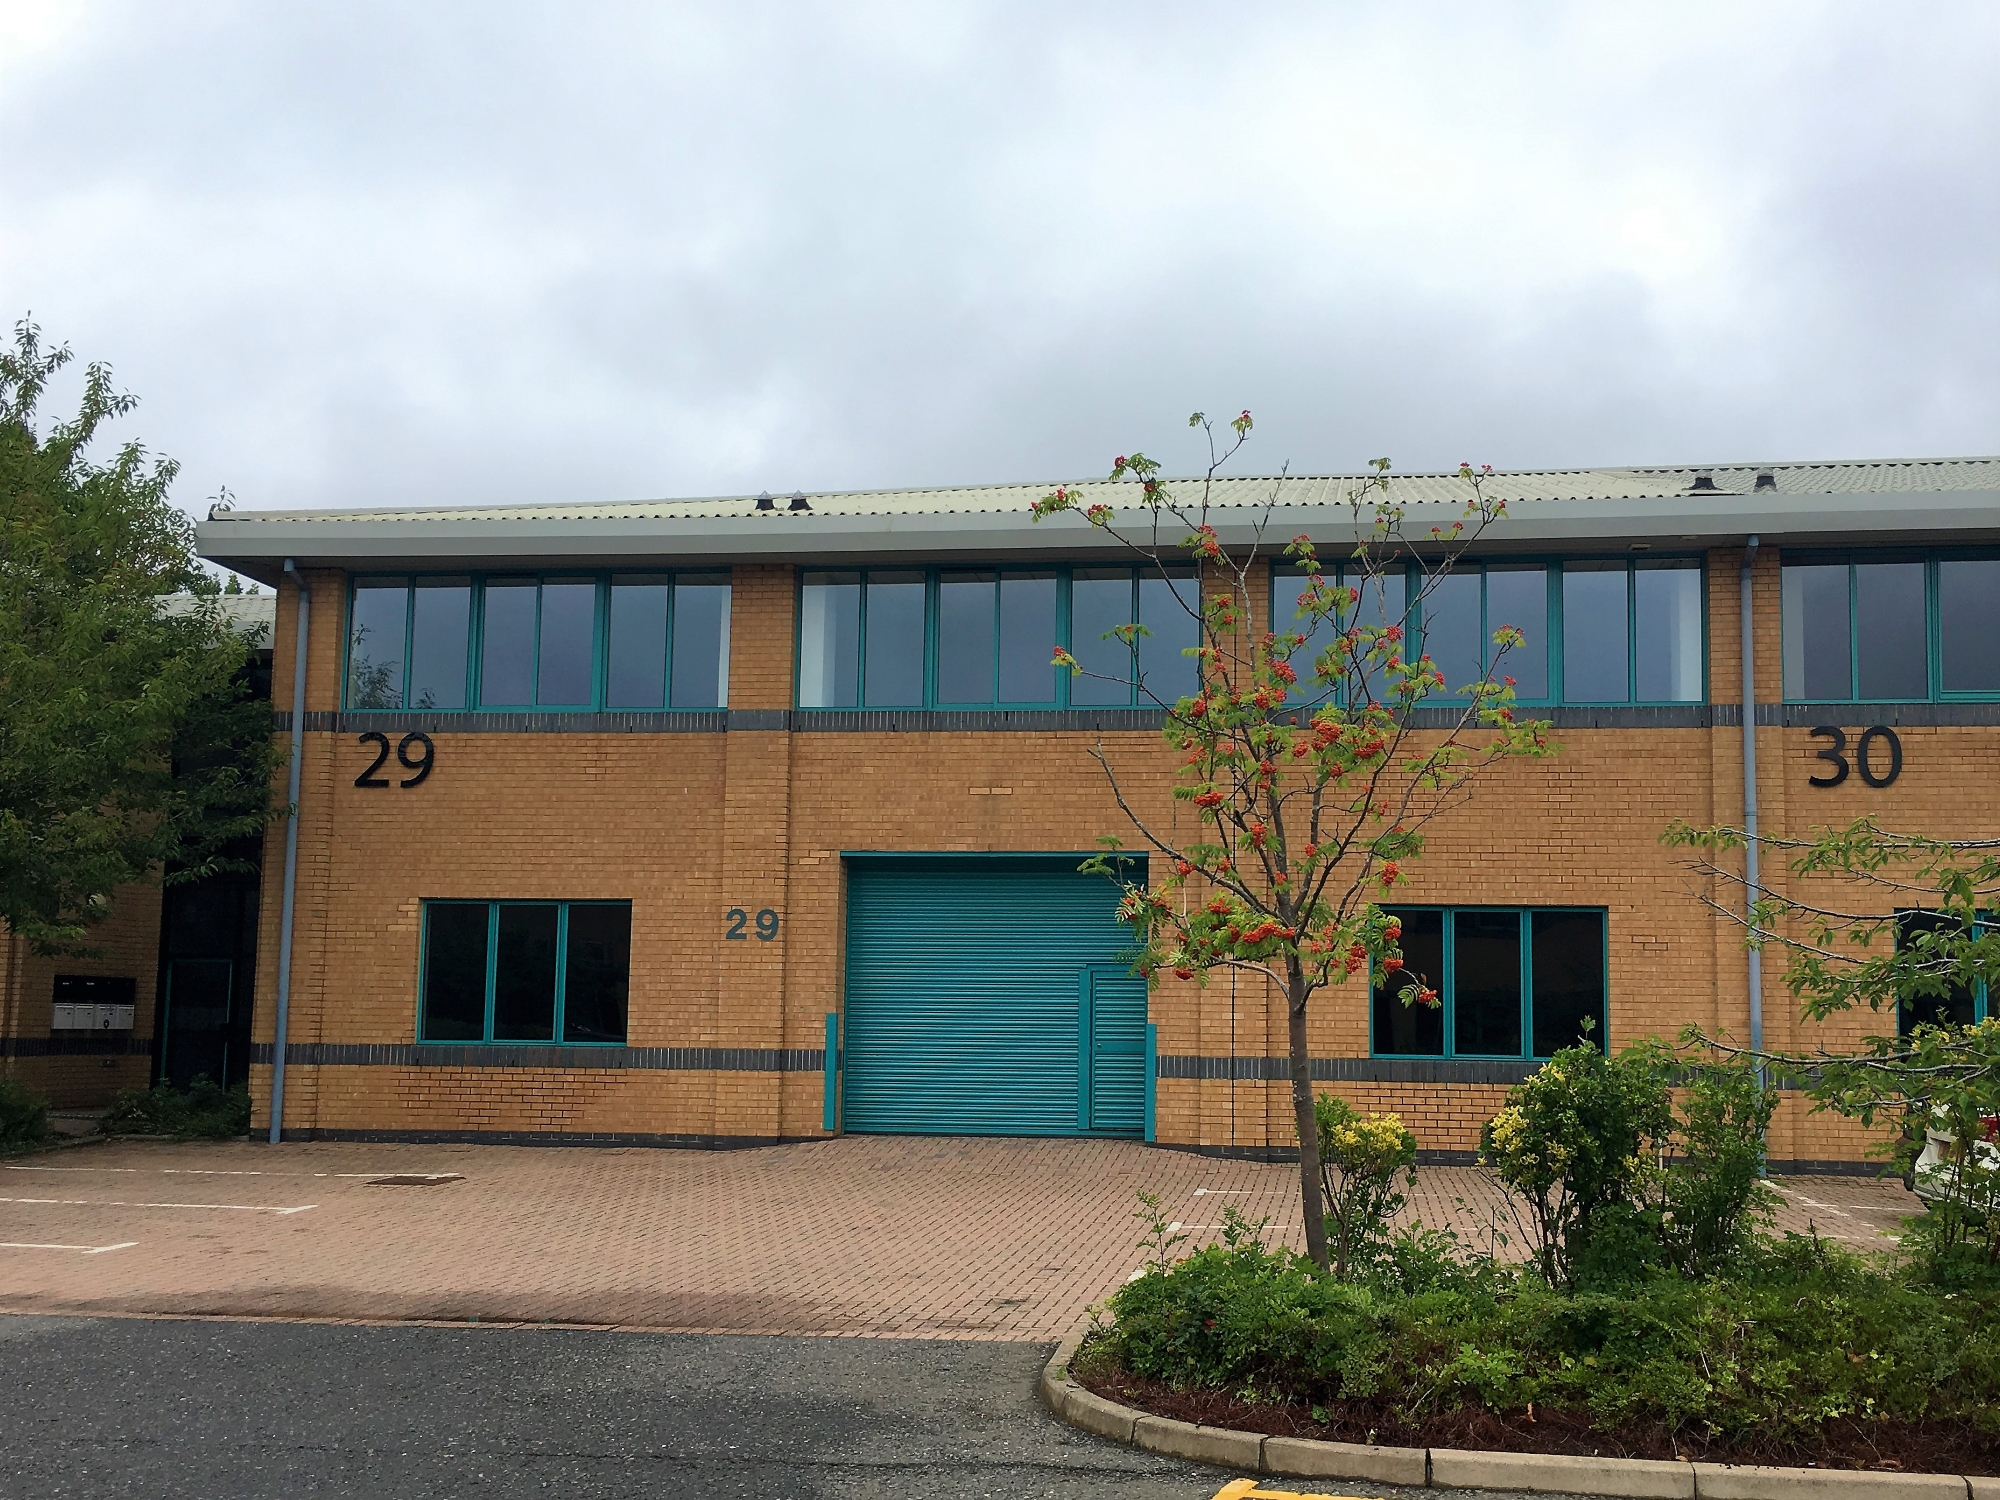 The Quadrant, Abingdon Science Park, OX14 3YS